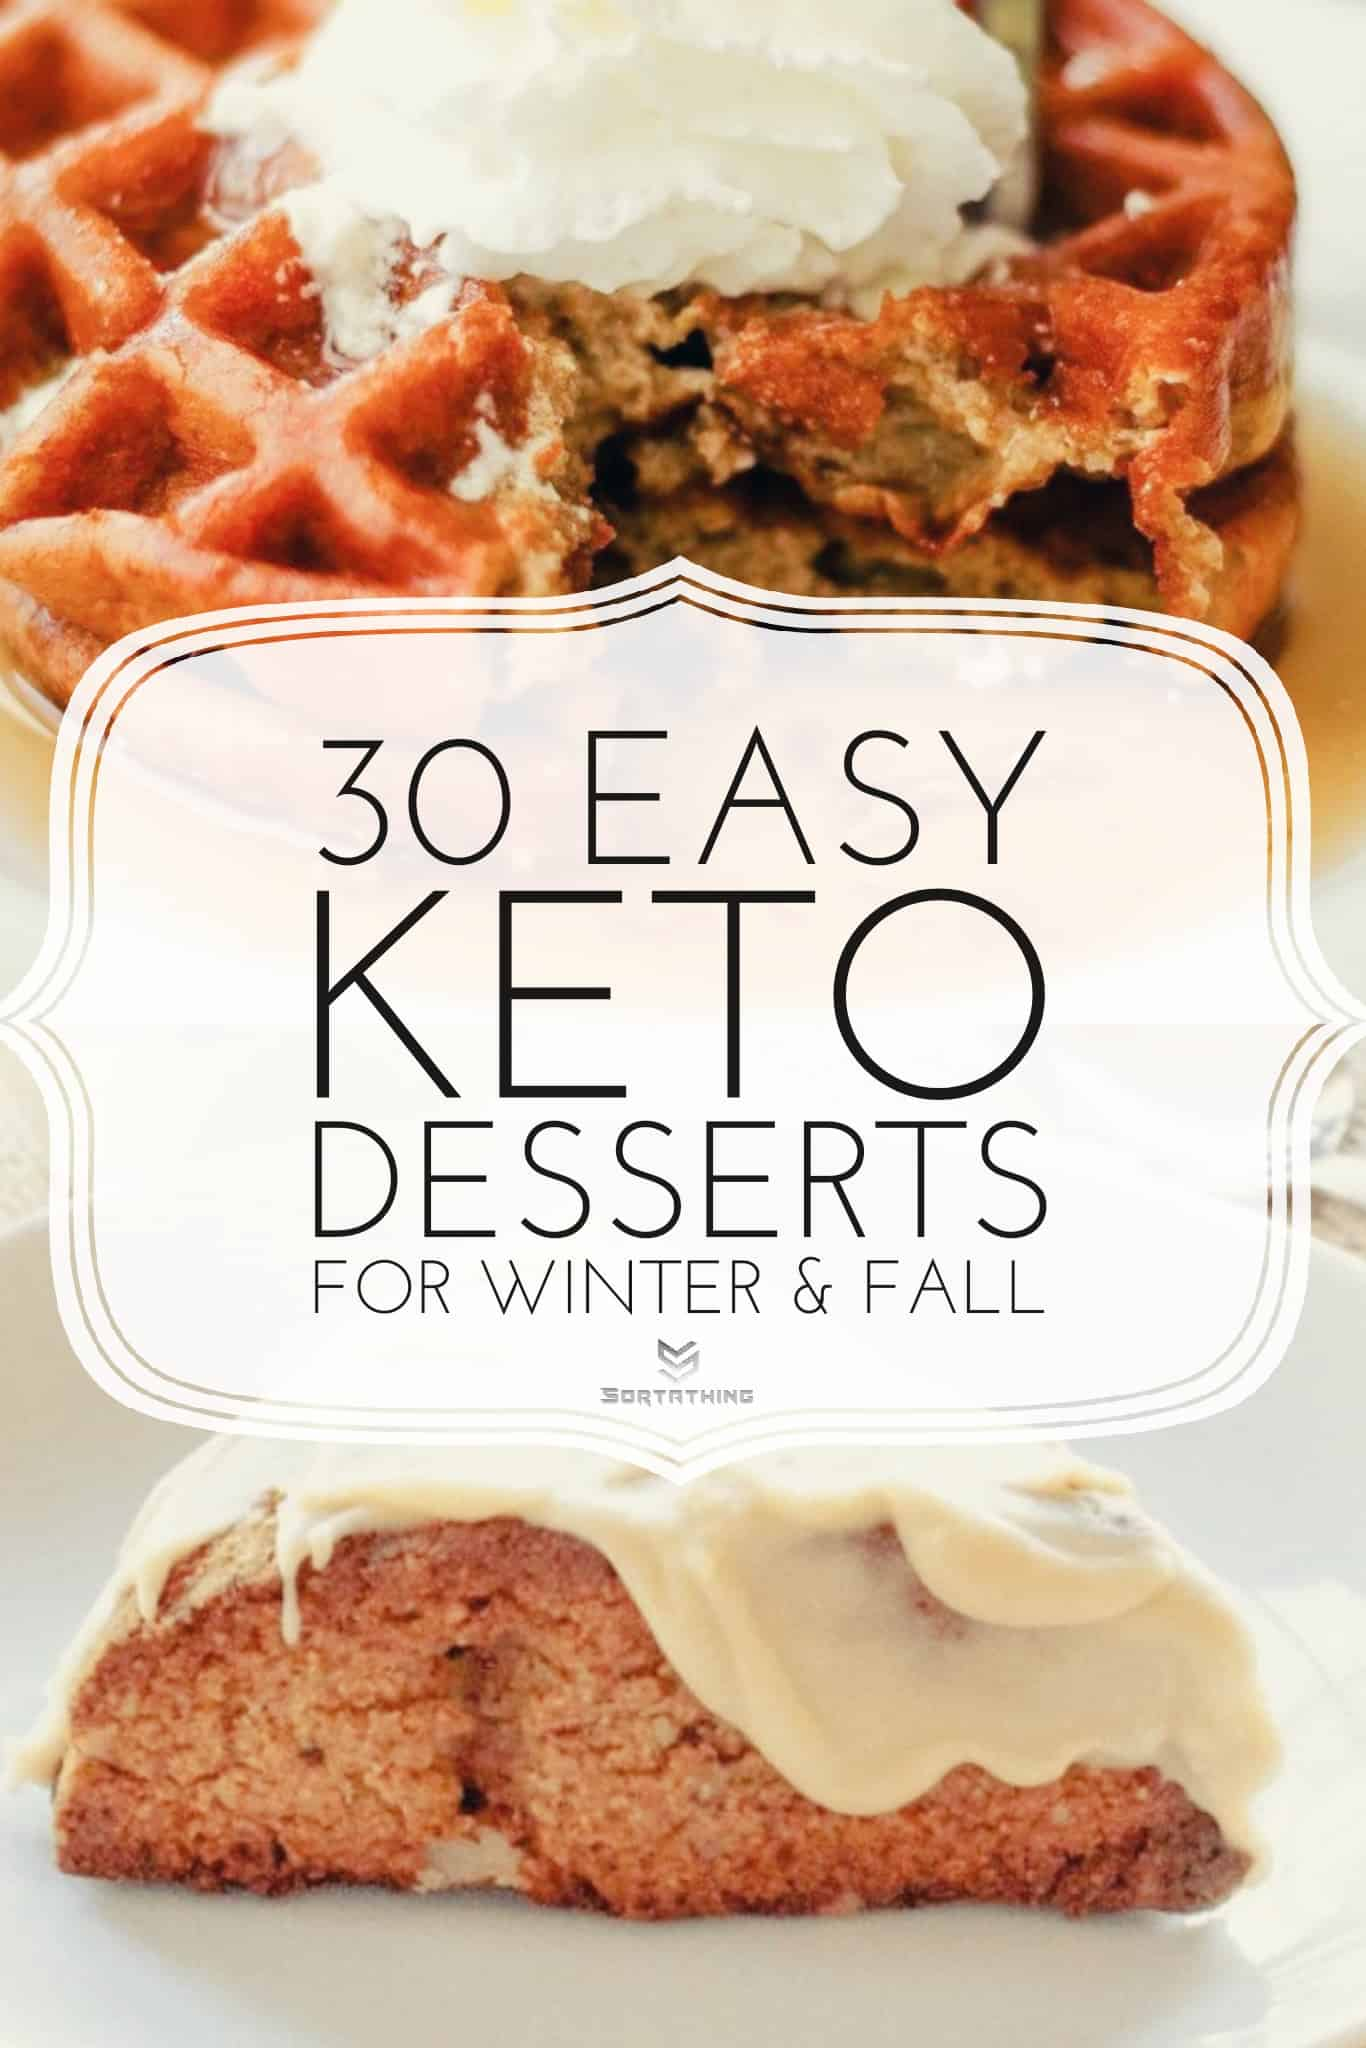 Maple Pumpkin Keto Waffle Recipe (Chaffle)and Maple Pecan Keto Scone